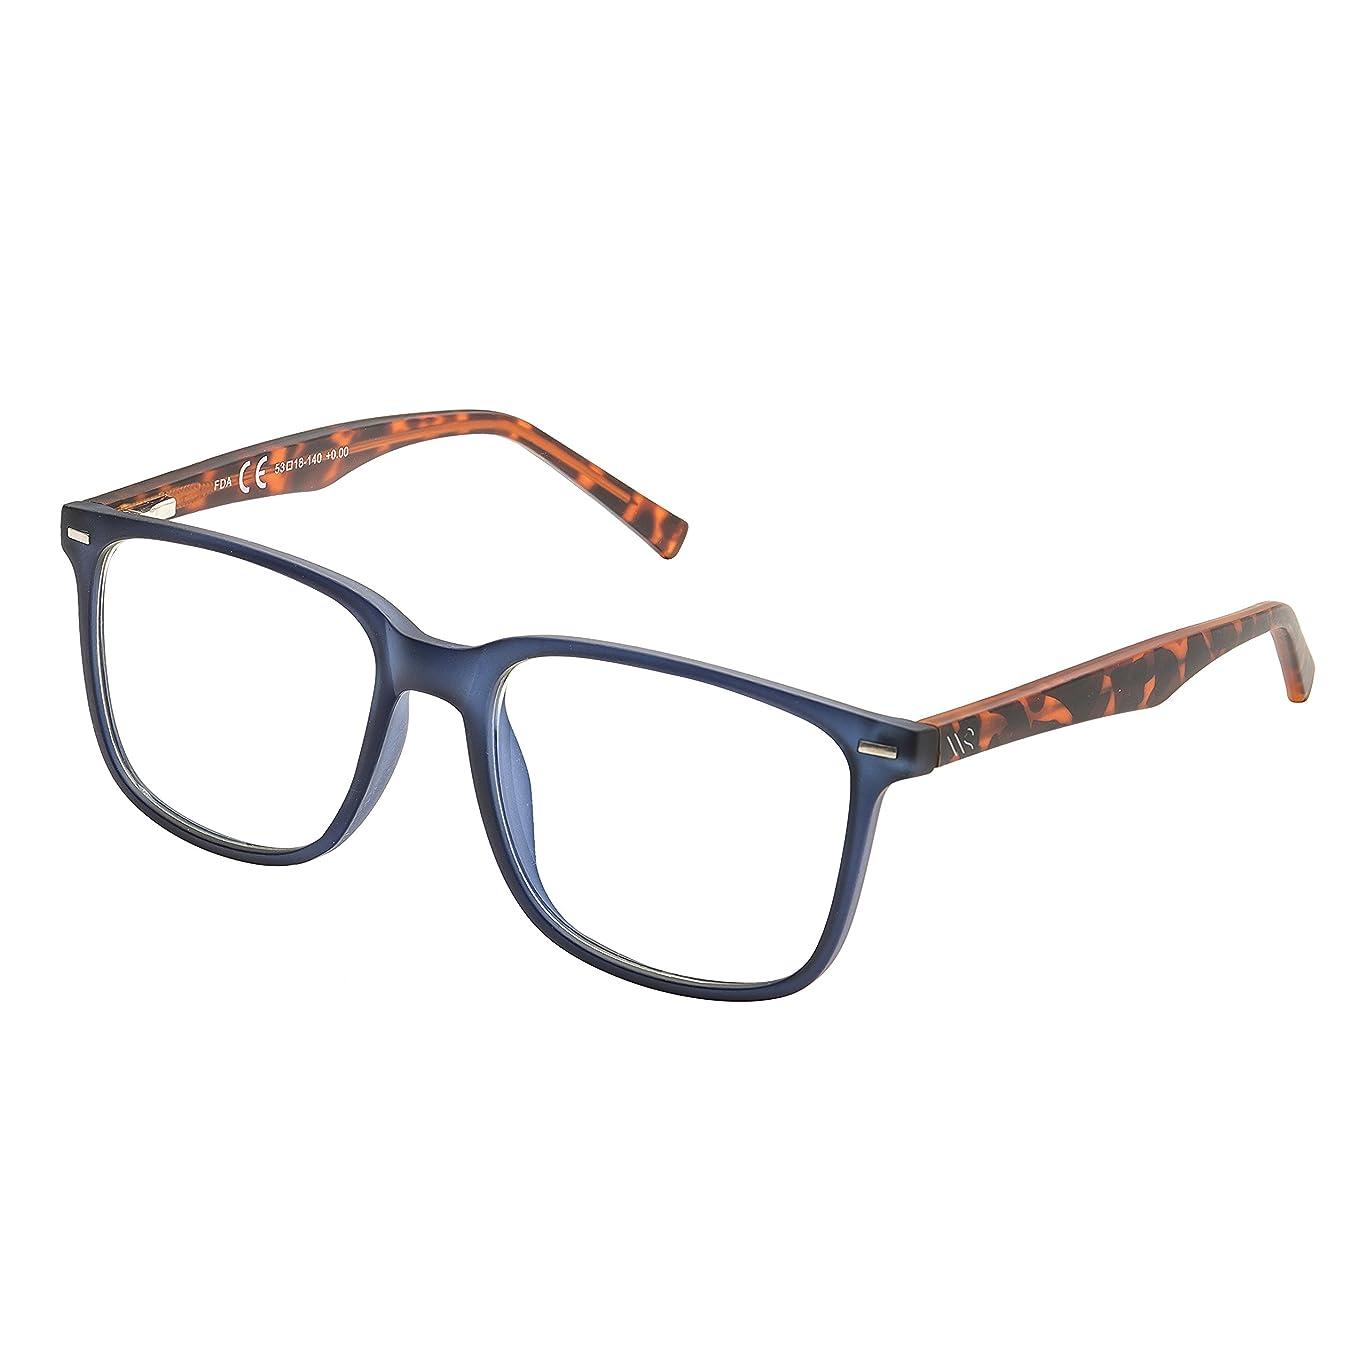 Blue Light Blocking Glasses,Cut UV400 Transparent Lens,Computer Reading Glasses,Anti Eyestrain/Anti Scratch/Anti Smudgy,Sleep Better for Women/Men (Bl